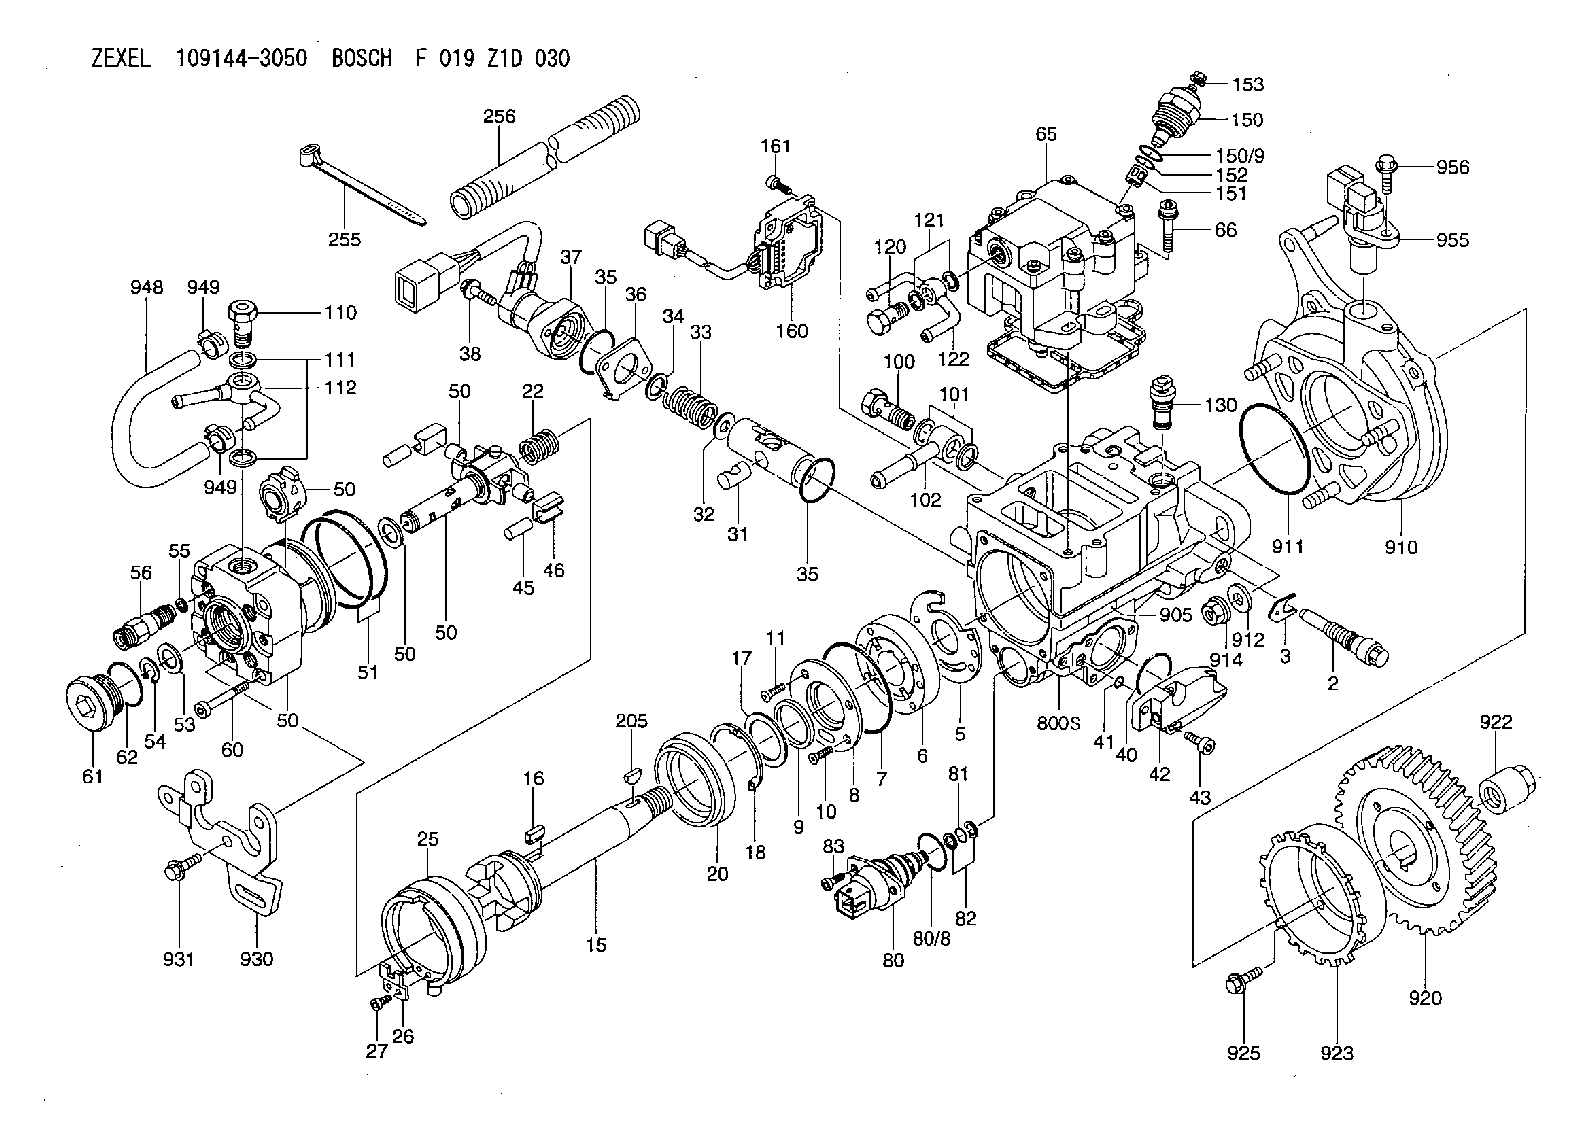 Zexel Pump Manual Cav Injection Diagram On Perkins Fuel Array 109144 3050 F 019 Z1d 030 Bosch Assembly Rh Inject